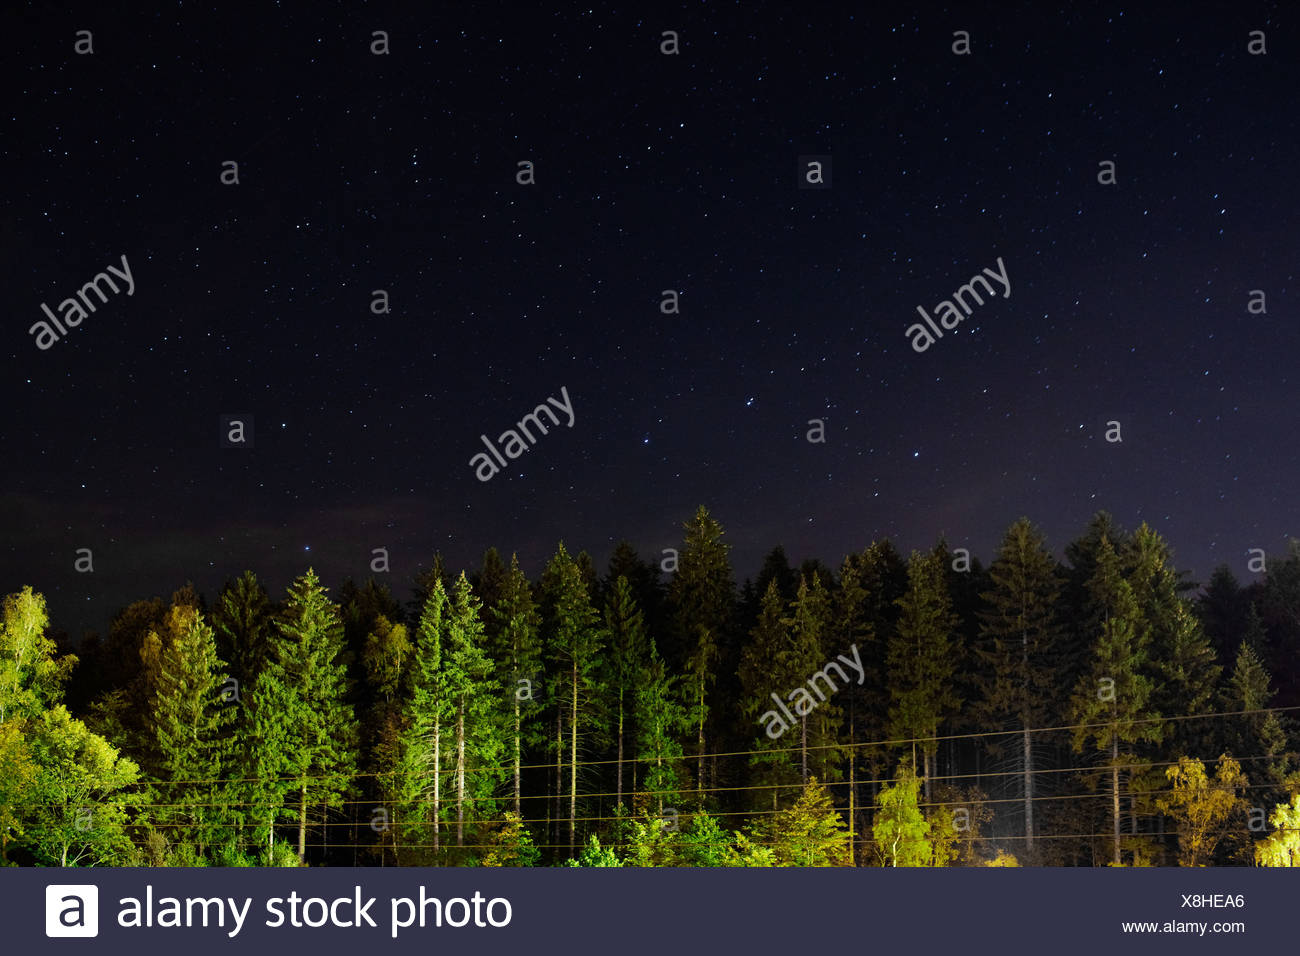 Trees and stars at night, Pobershau, Germany - Stock Image